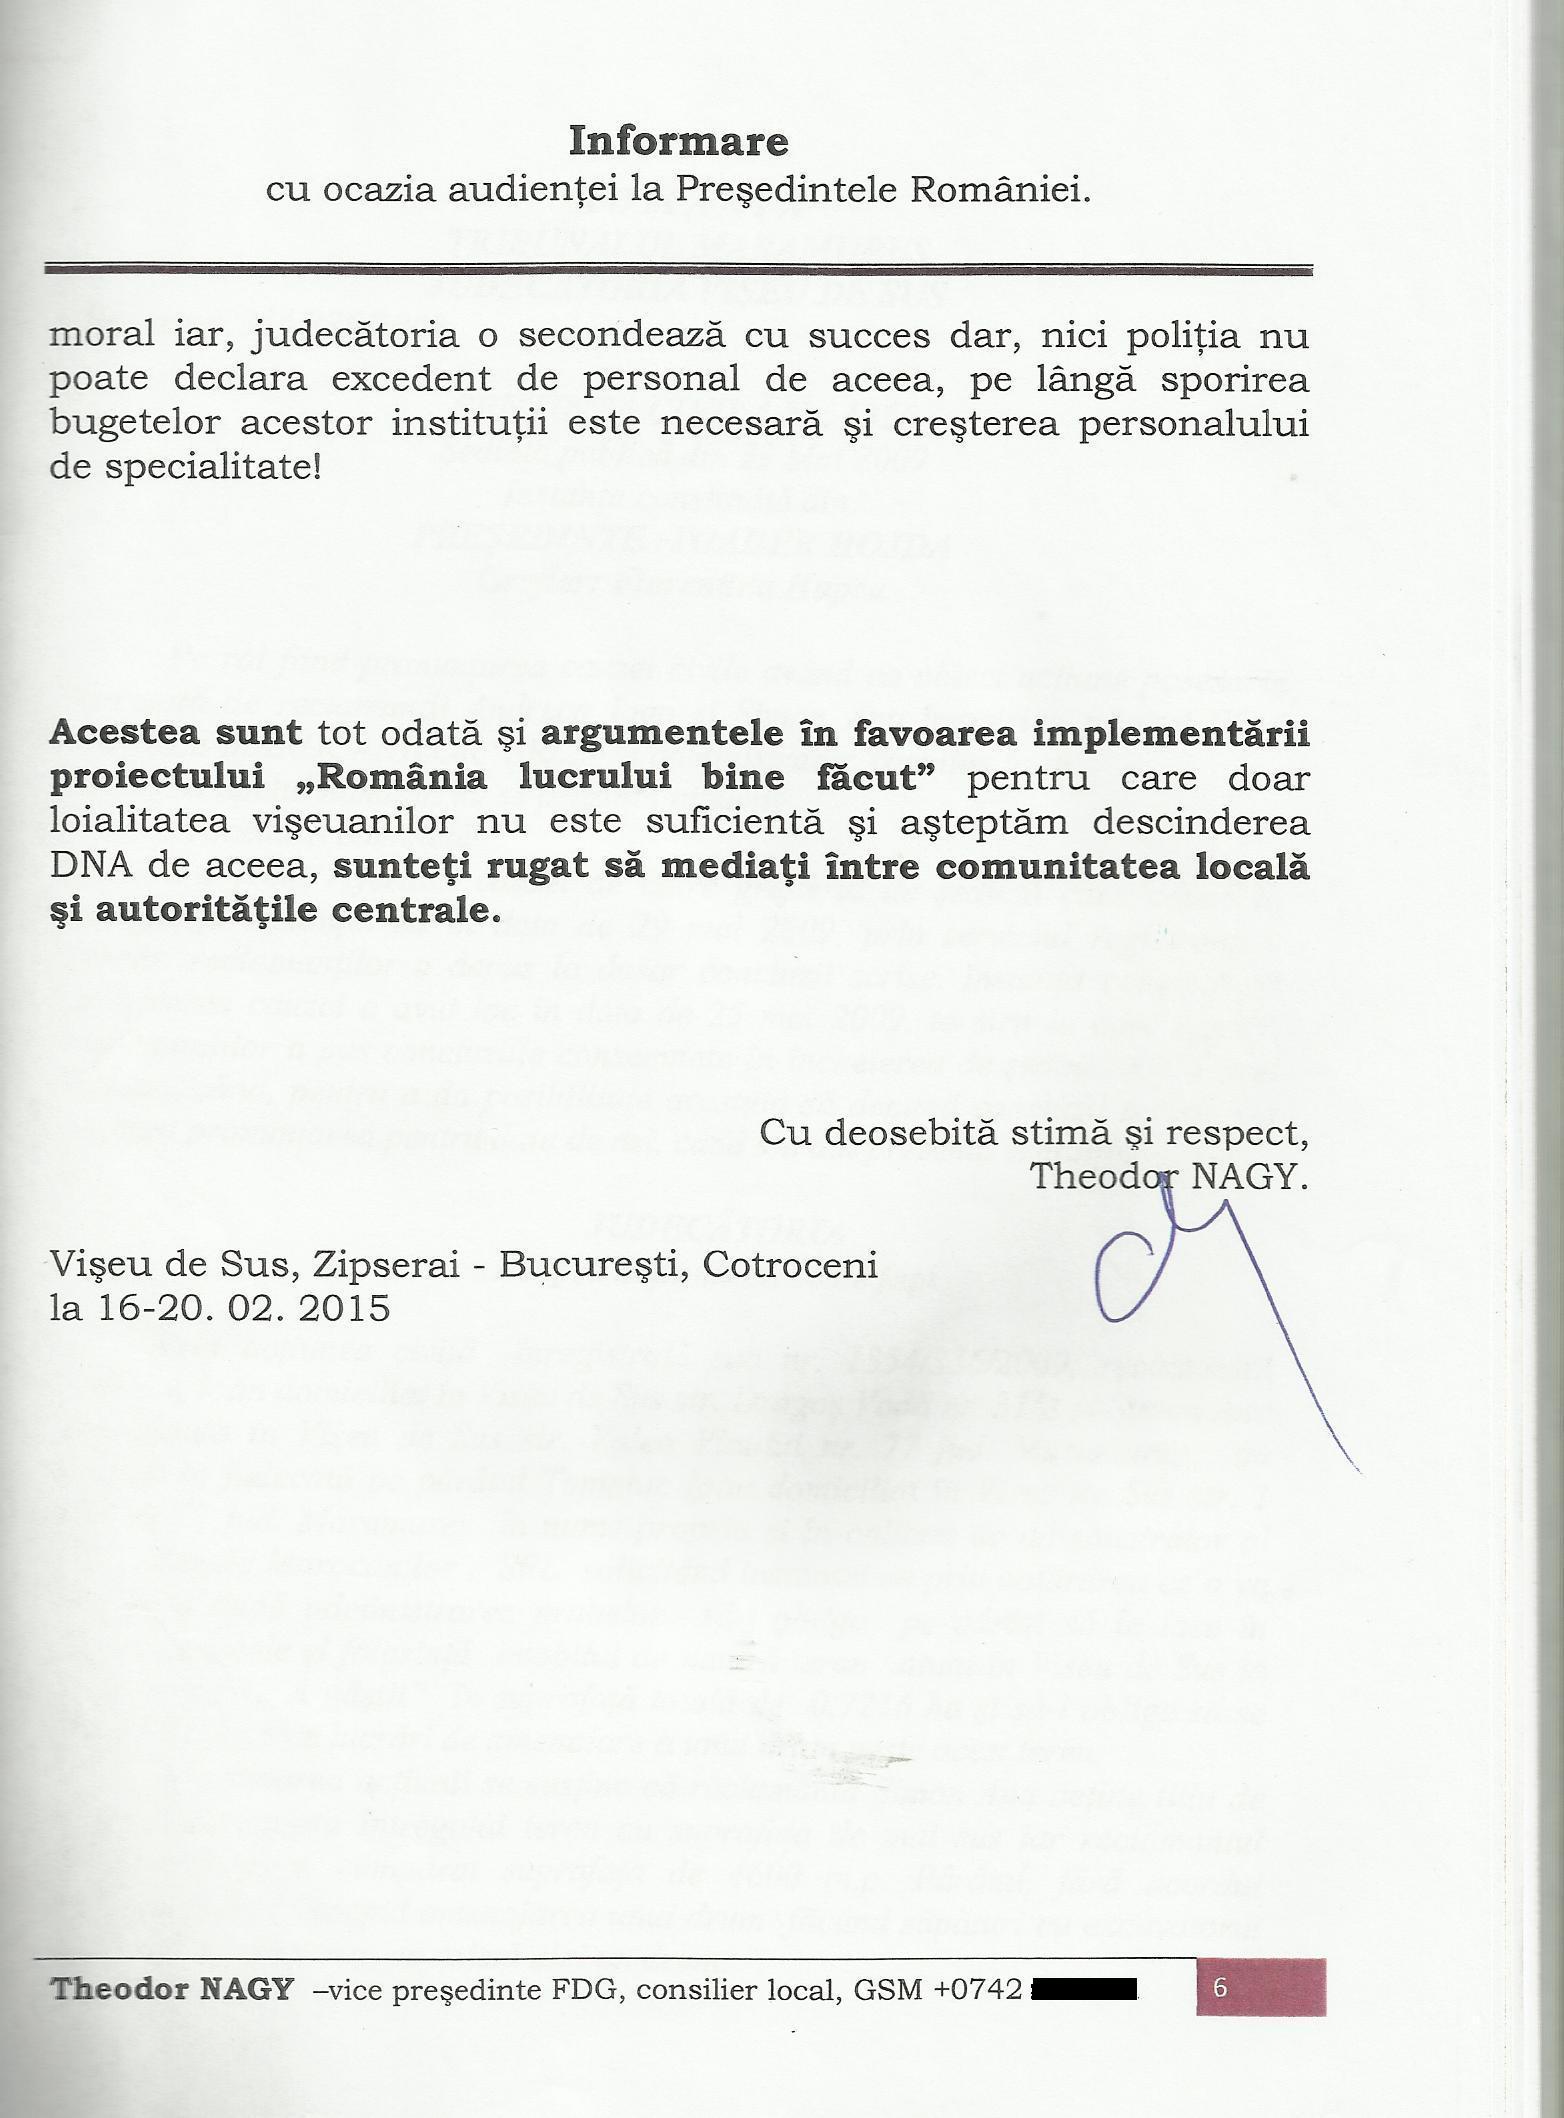 Informare Iohannis script pag. semnatura originala TN